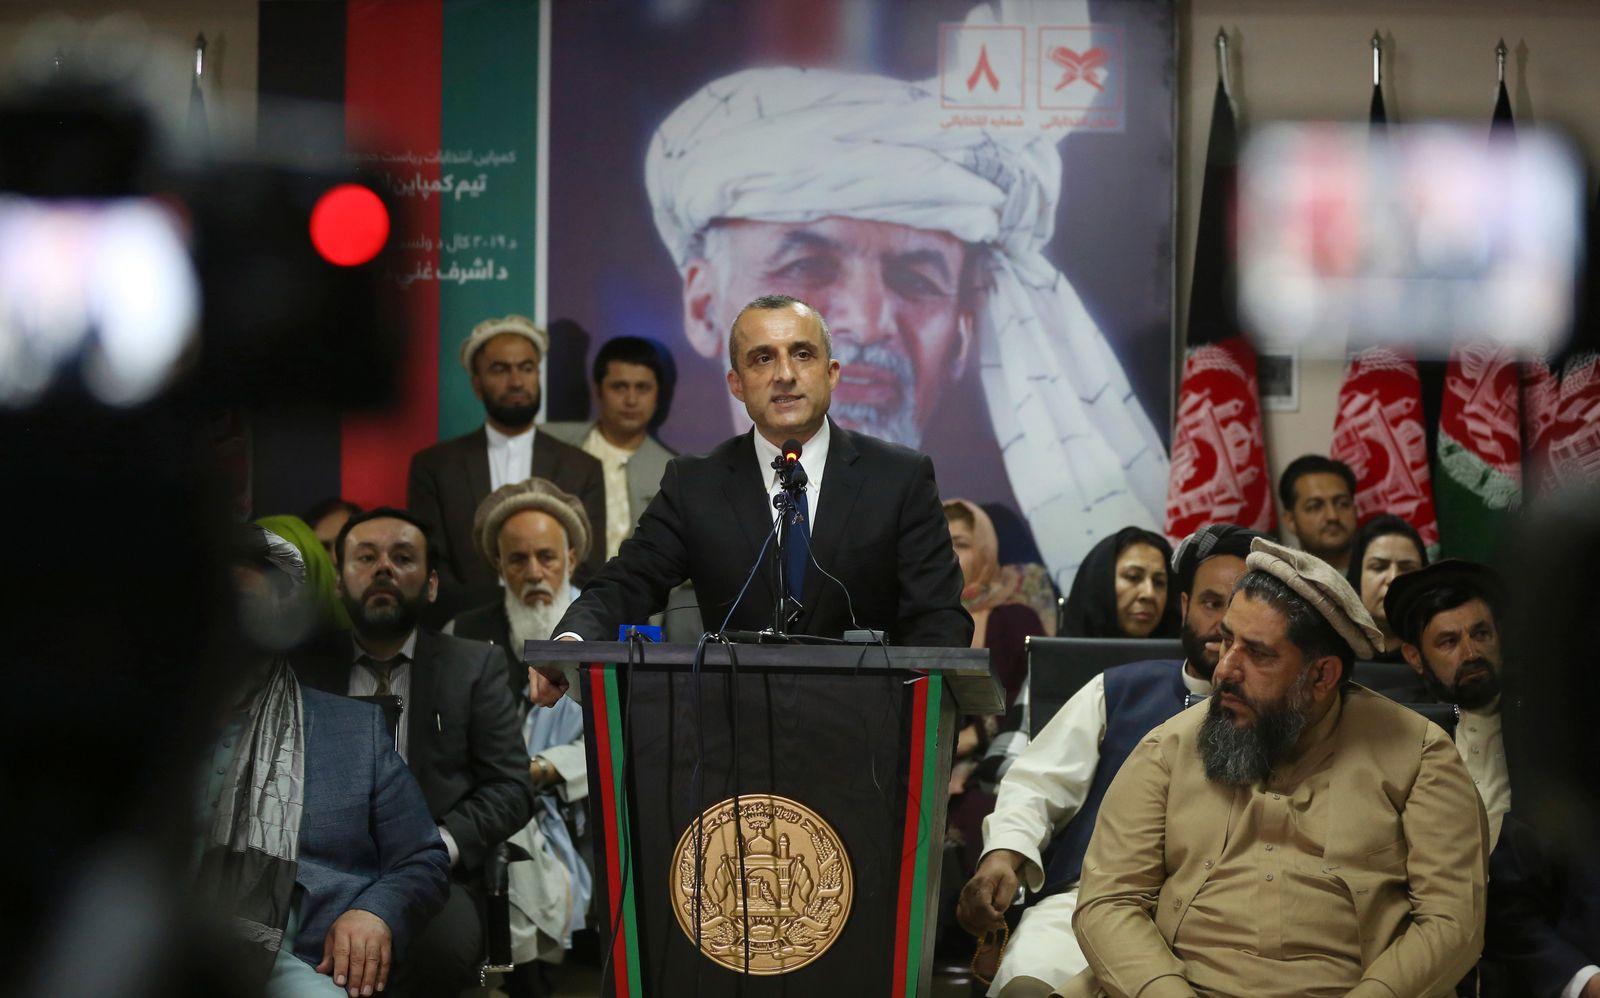 First Vice President candidate Amrullah Saleh